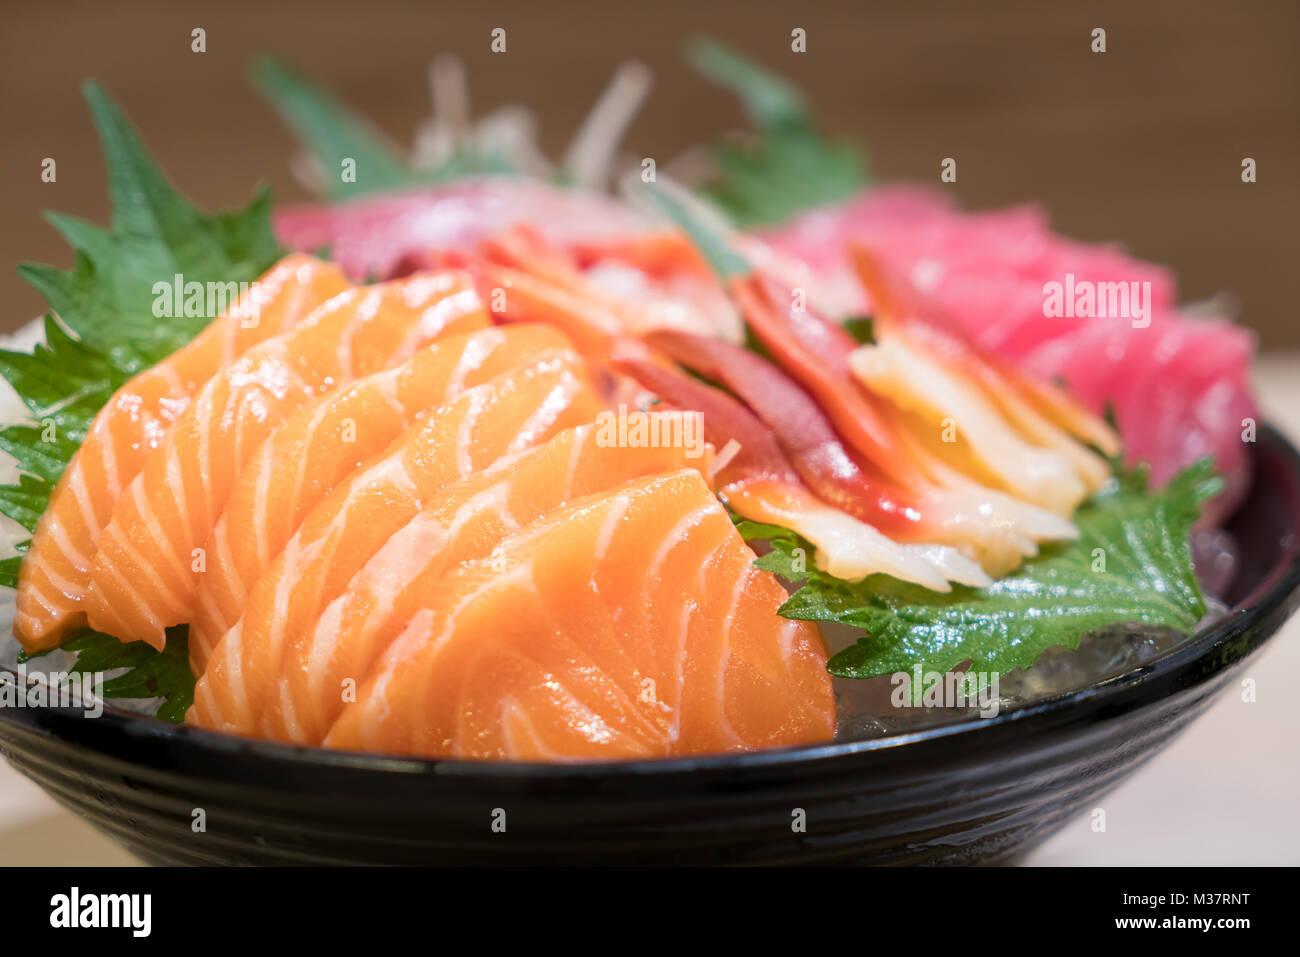 Mixed Sliced Fish Sashimi On Ice In Black Bowl Sashimi Salmon Tuna